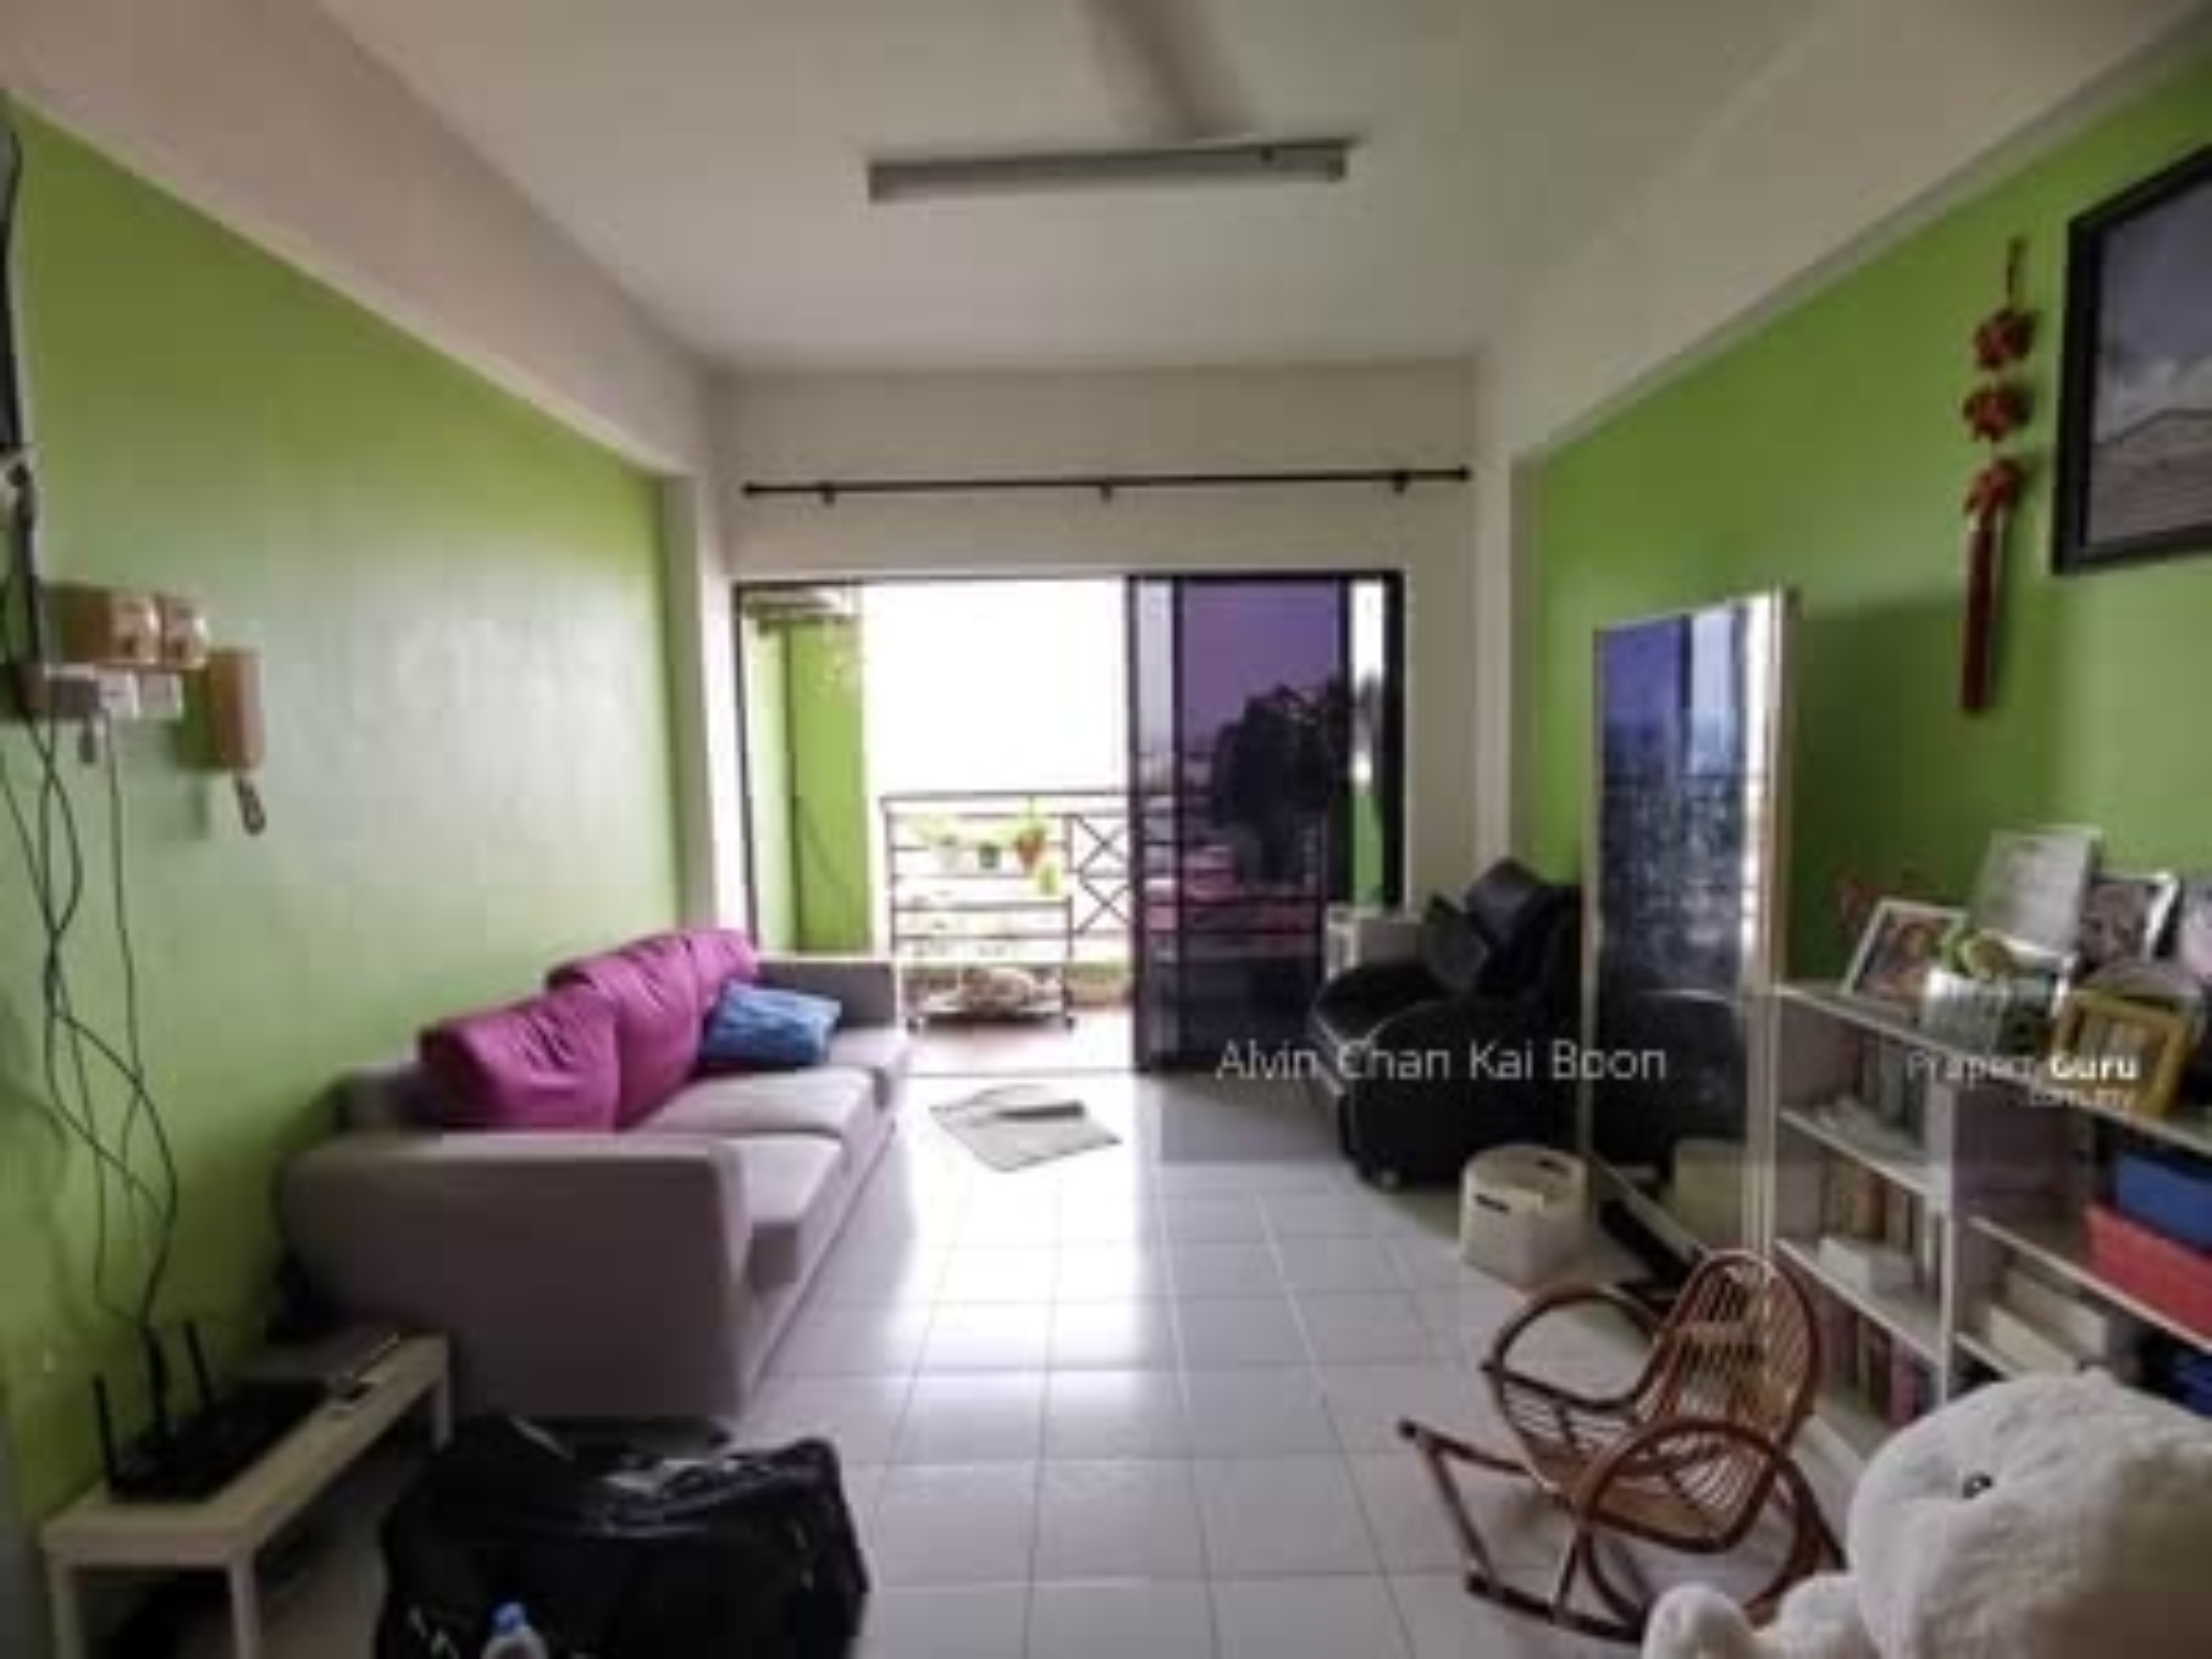 For Sale - Kondominium Siantan Puri (8th Avenue)